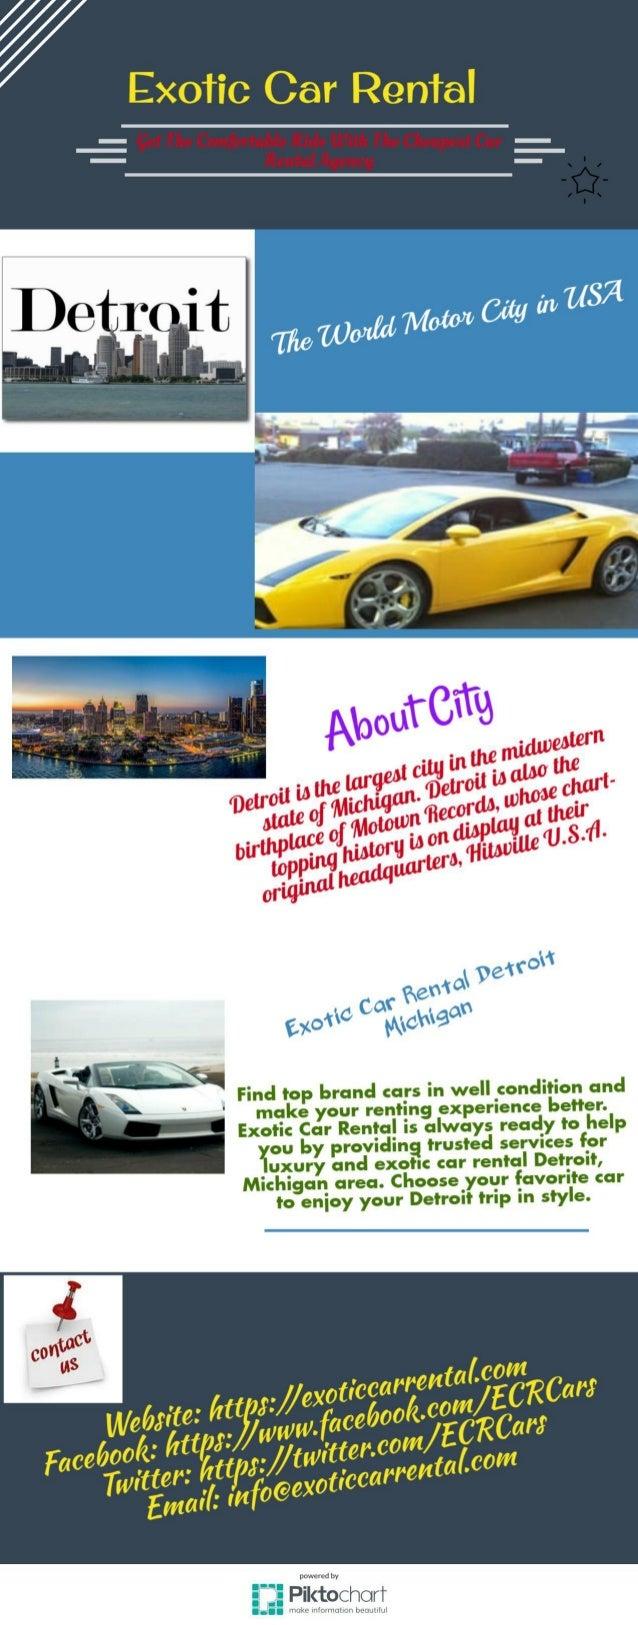 Exotic Car Rental Detroit Michigan